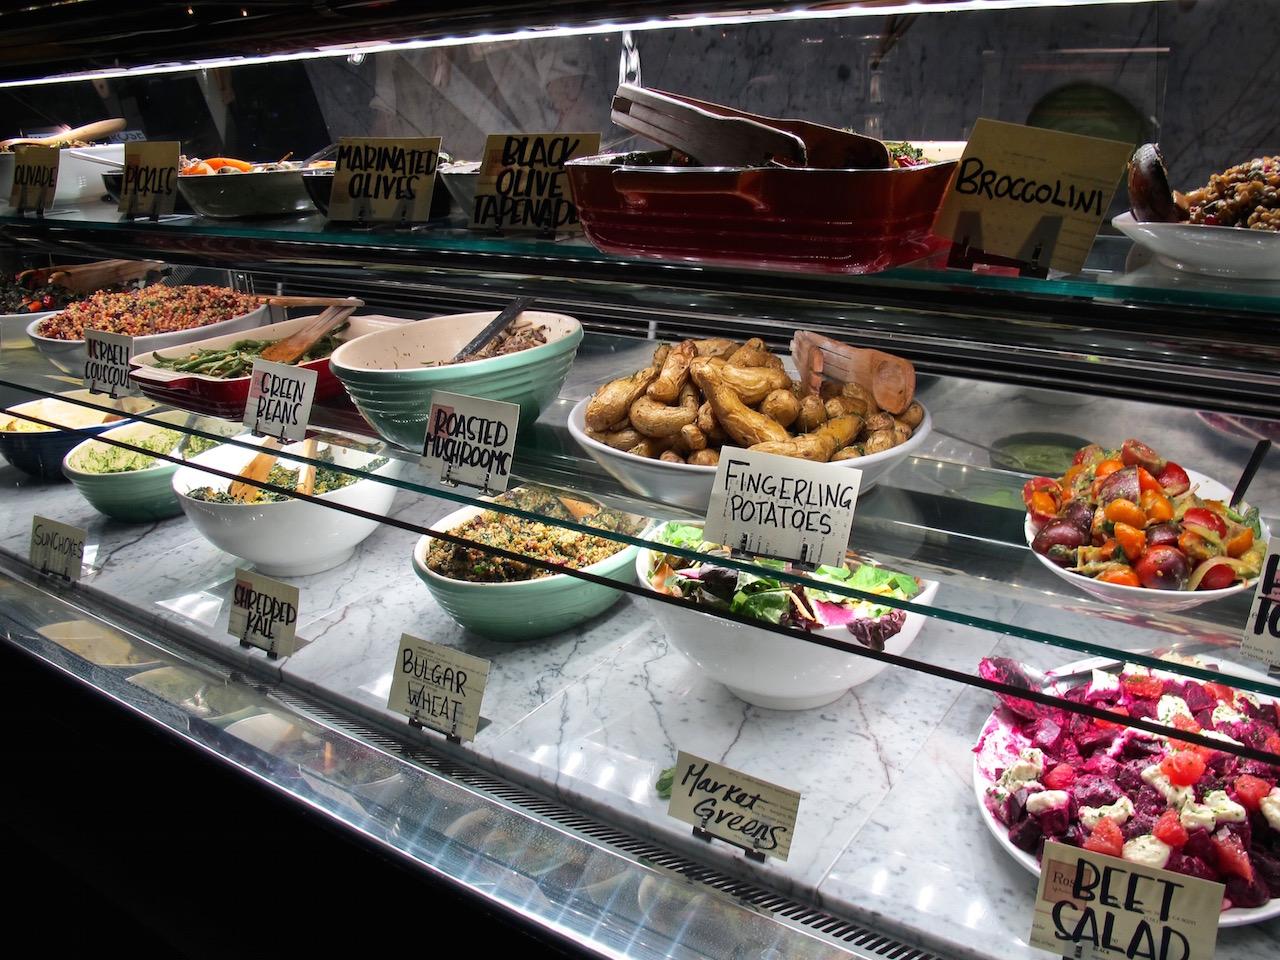 Rose Venice Cafe salad counter